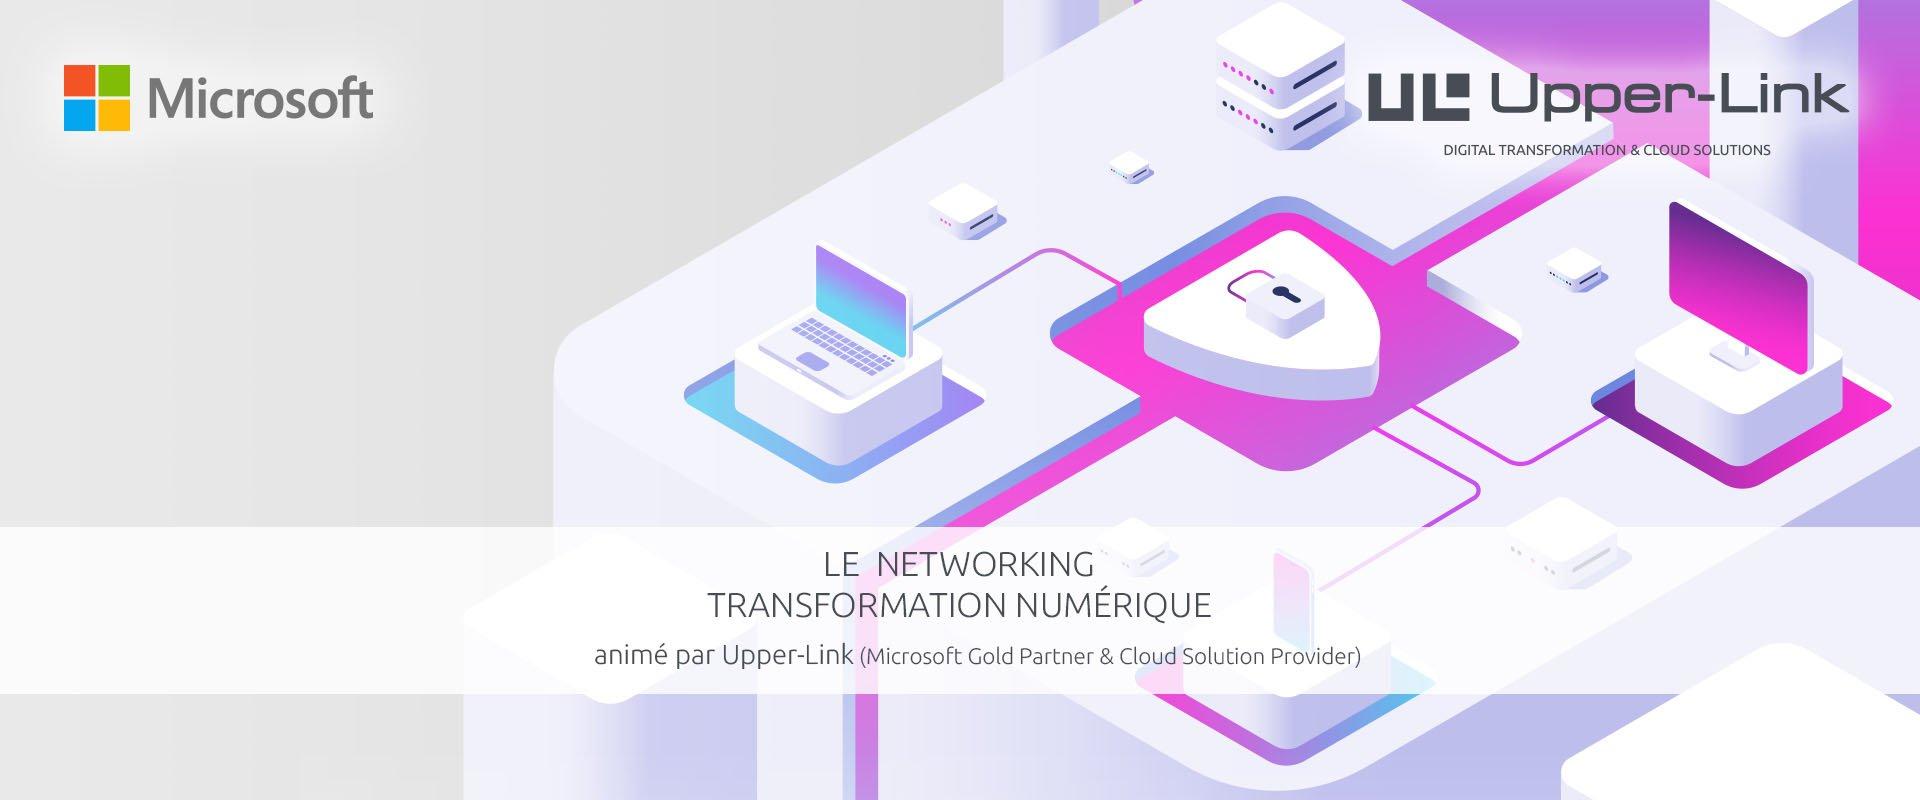 20190514 - Head Mail - Invitation rencontre UL-1